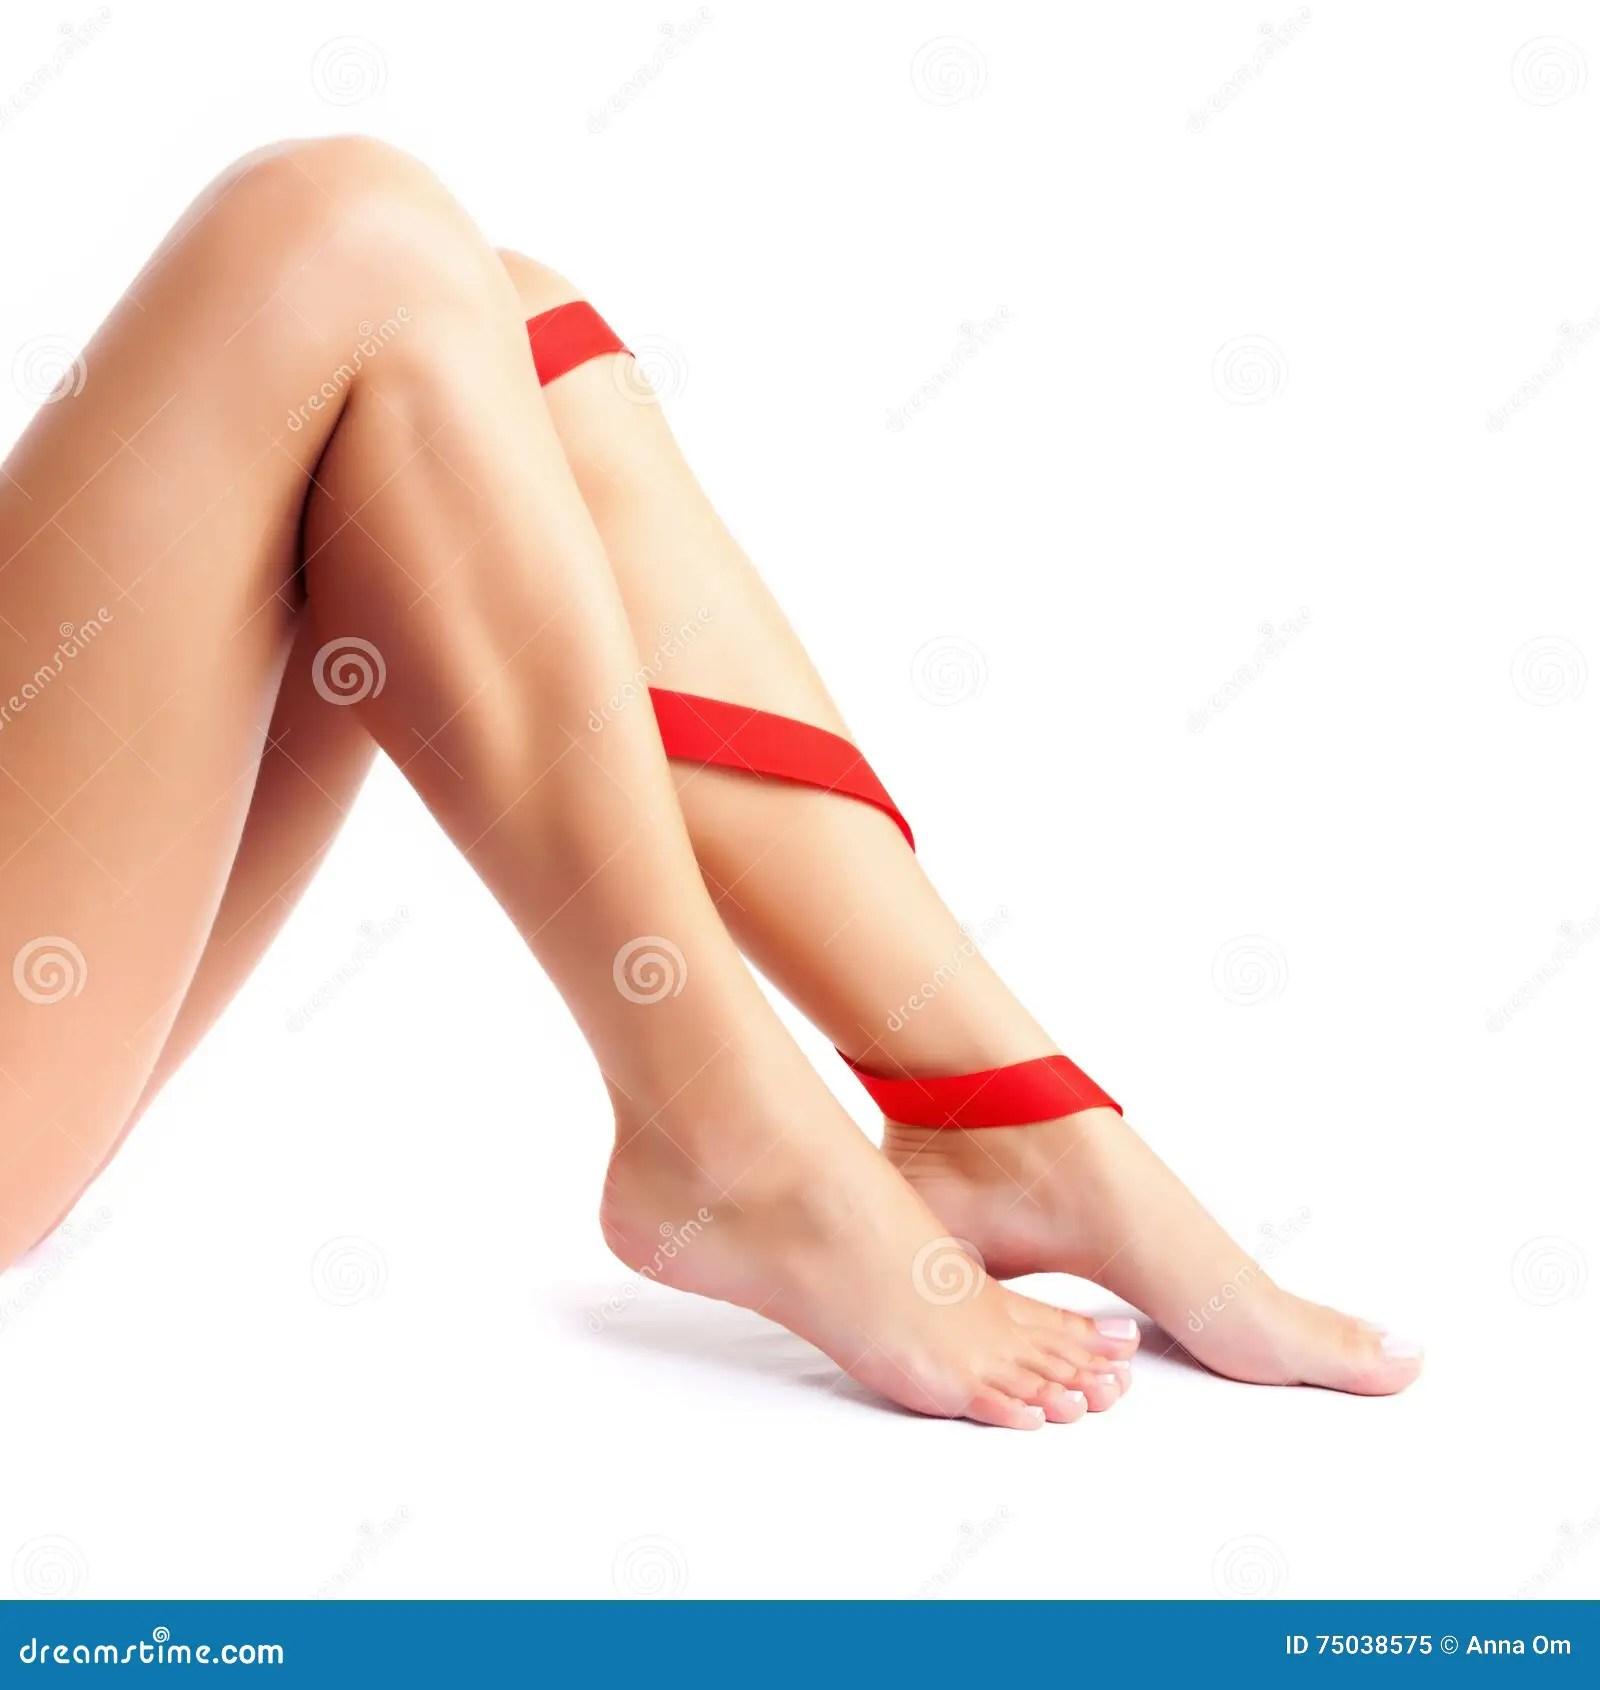 6 Bones Of Feet And Legs